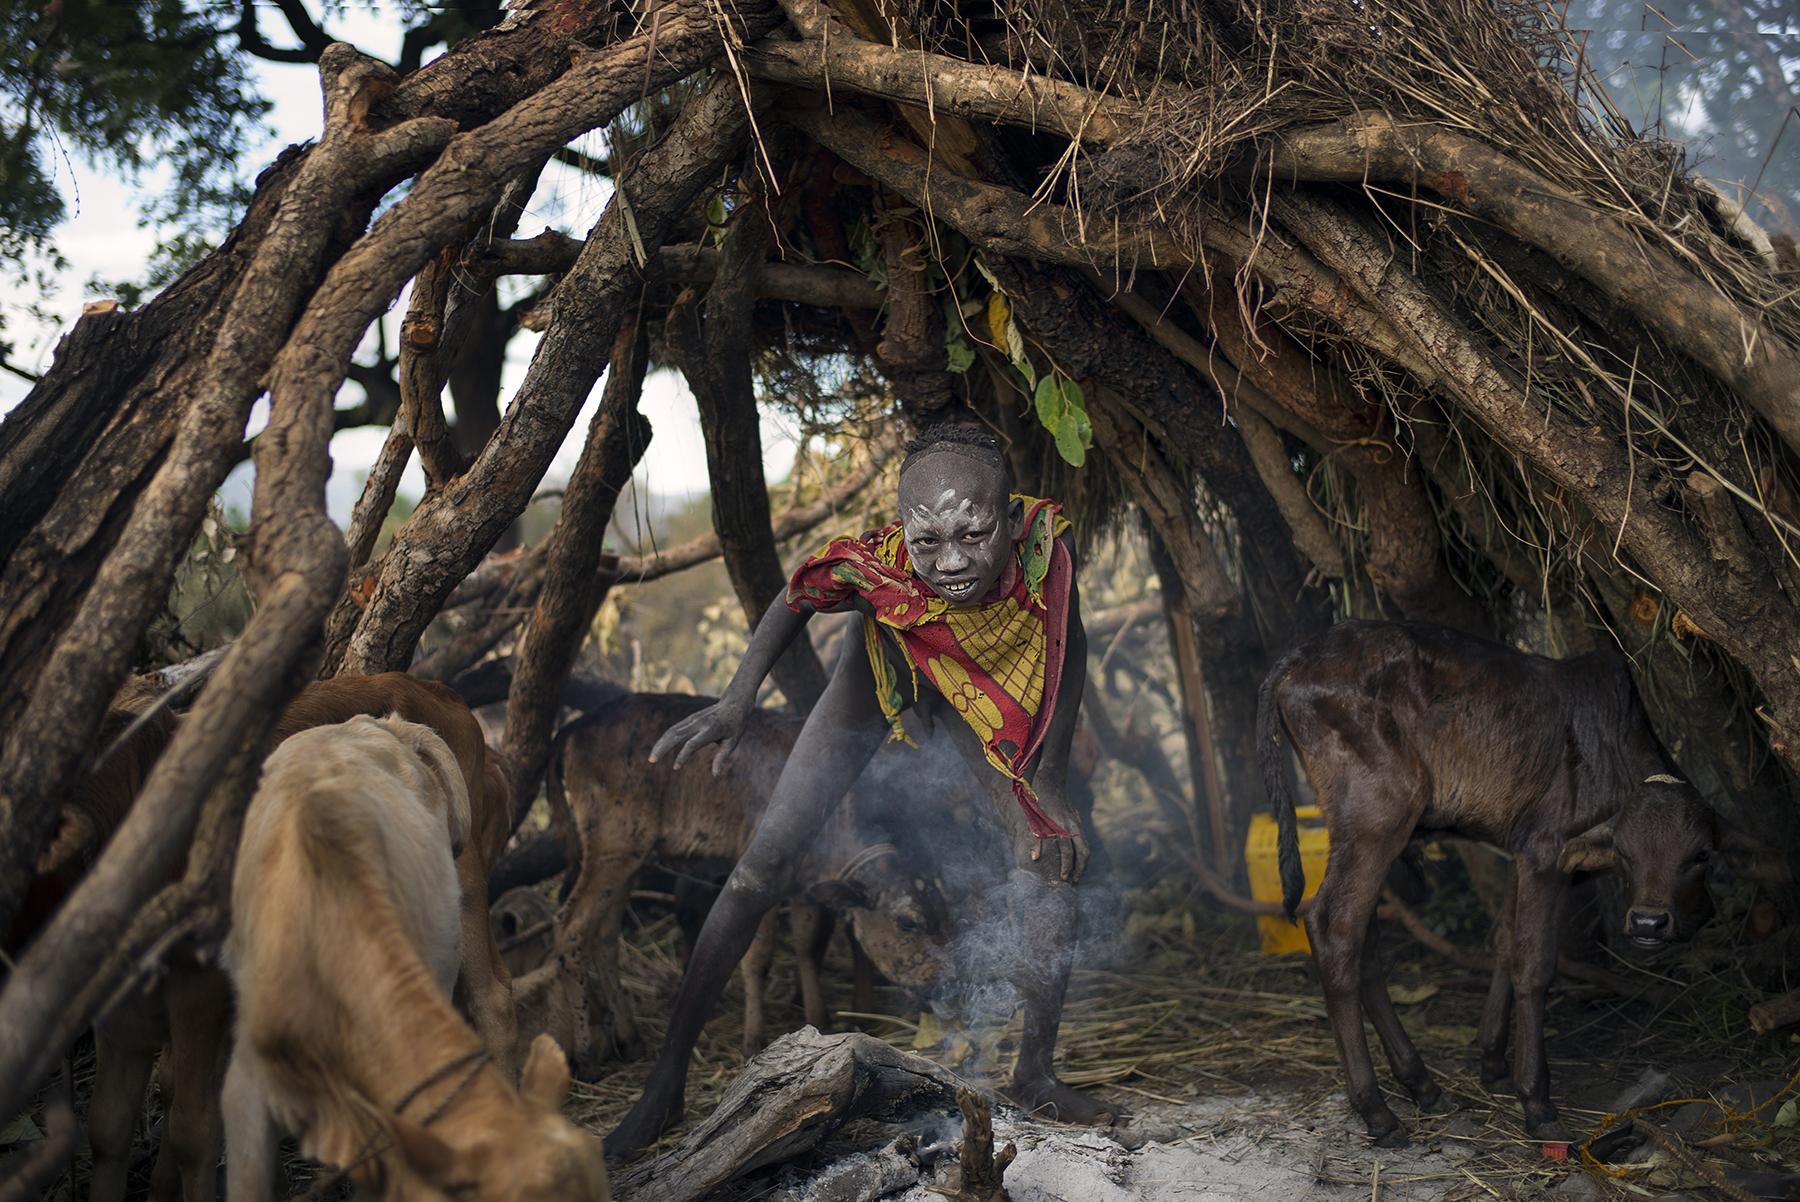 David Nam Lip_LEE_The Ritual Belong To The Suri Tribe Of Ethiopia_The Place I Live Last Night_02.jpg